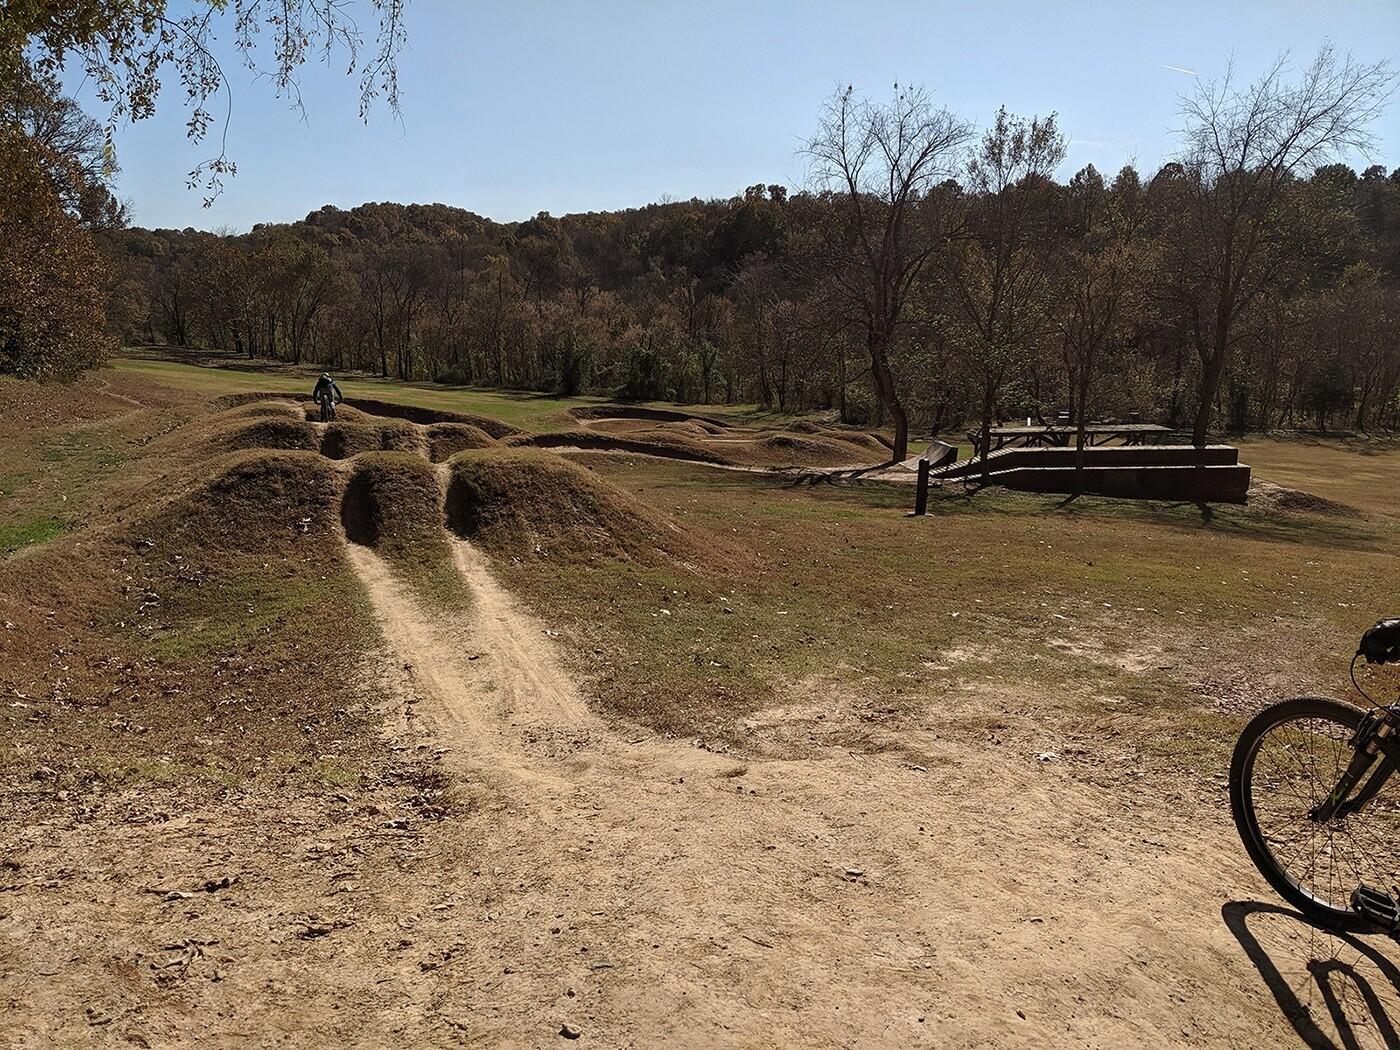 A bike park in Bentonville, AR.